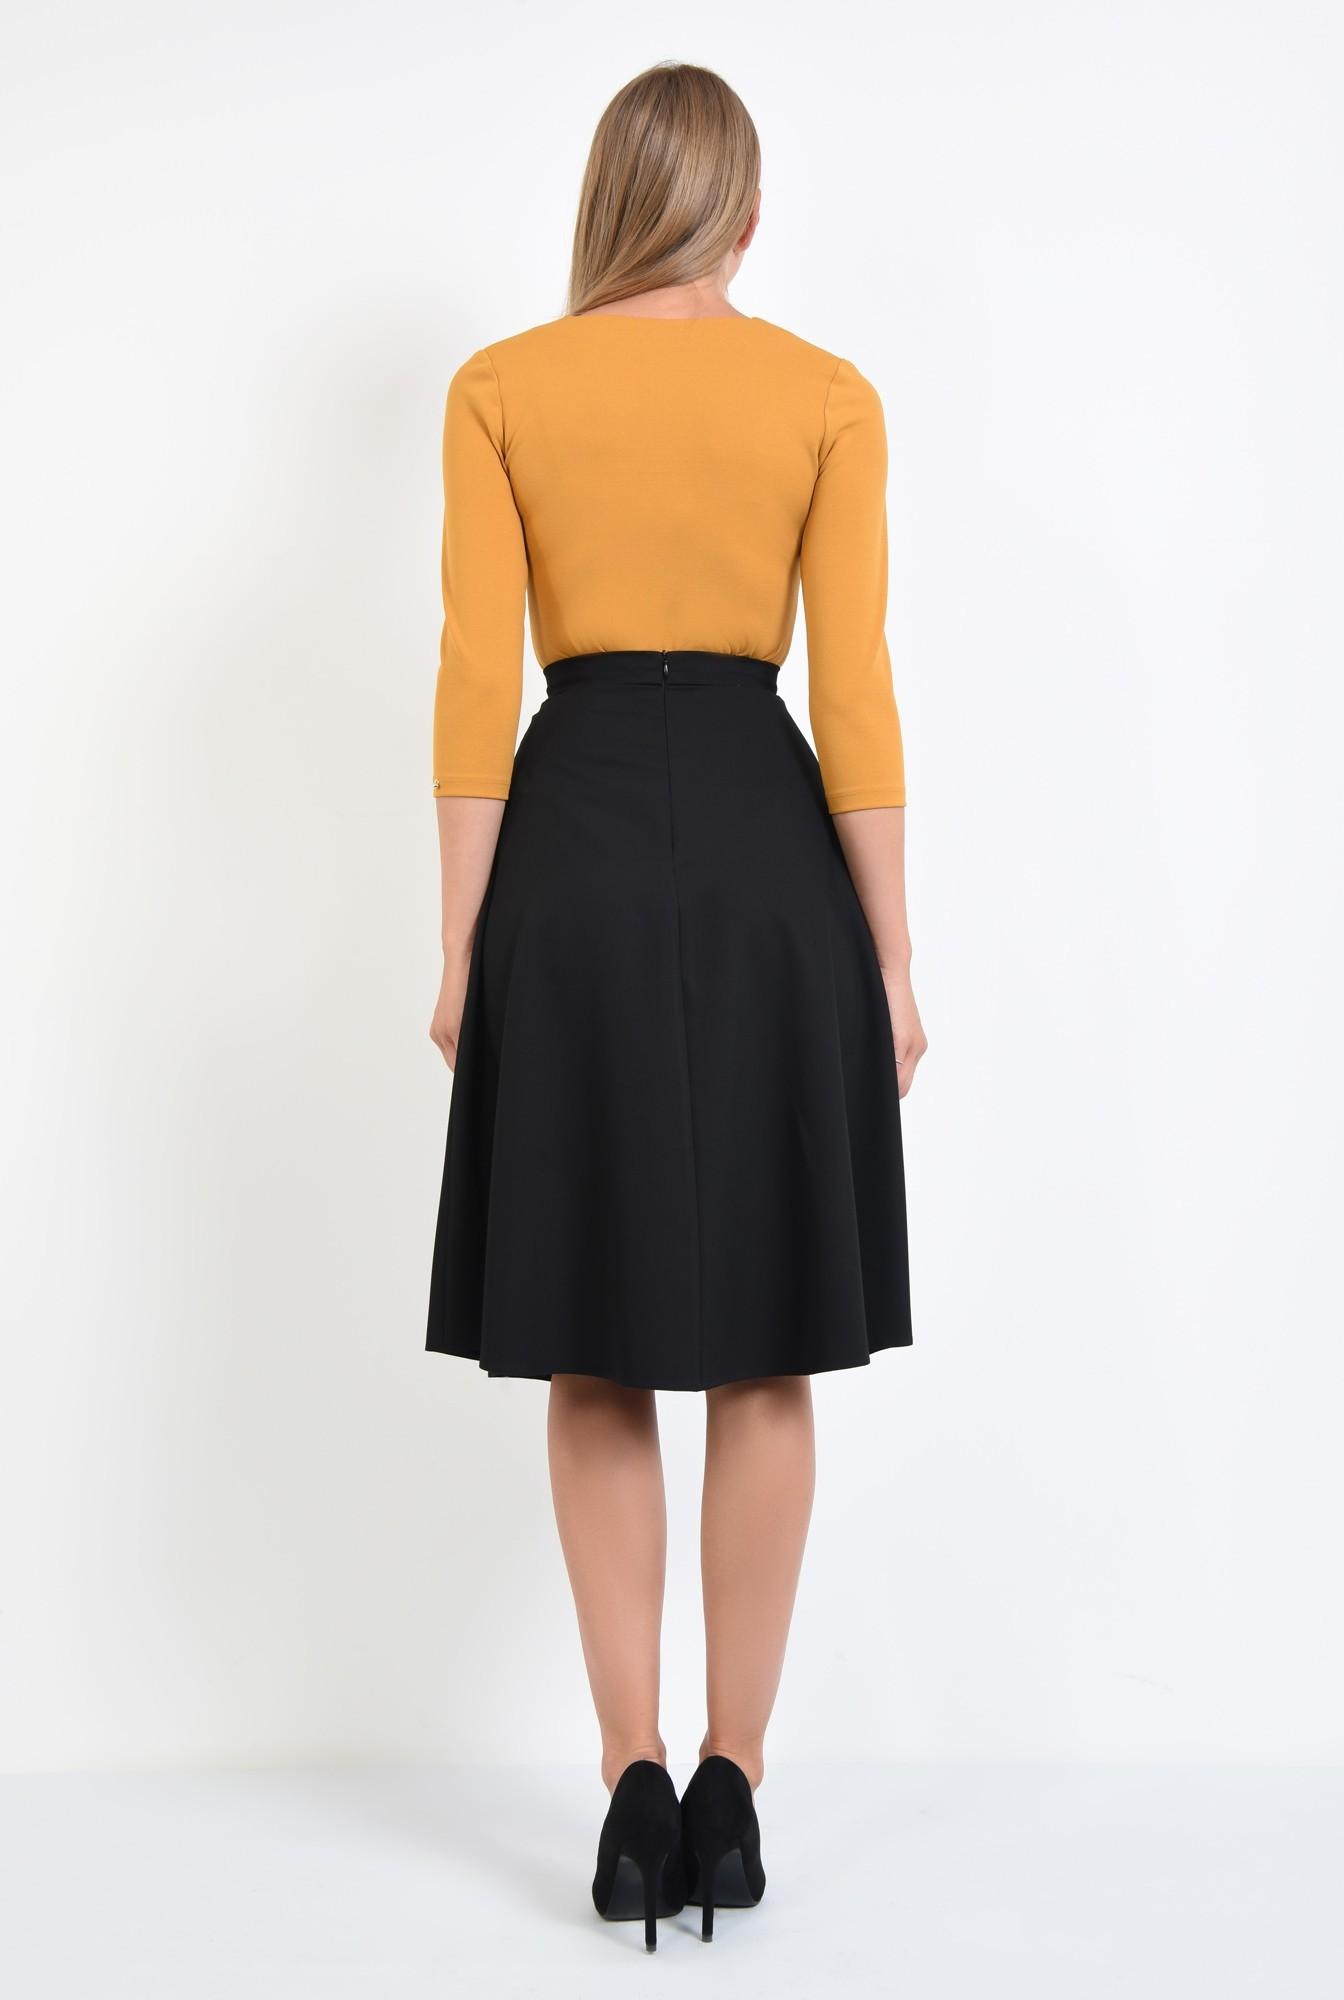 1 - 360 - bluza casual mustar, decoltata, croi drept, anchior, tesatura elastica